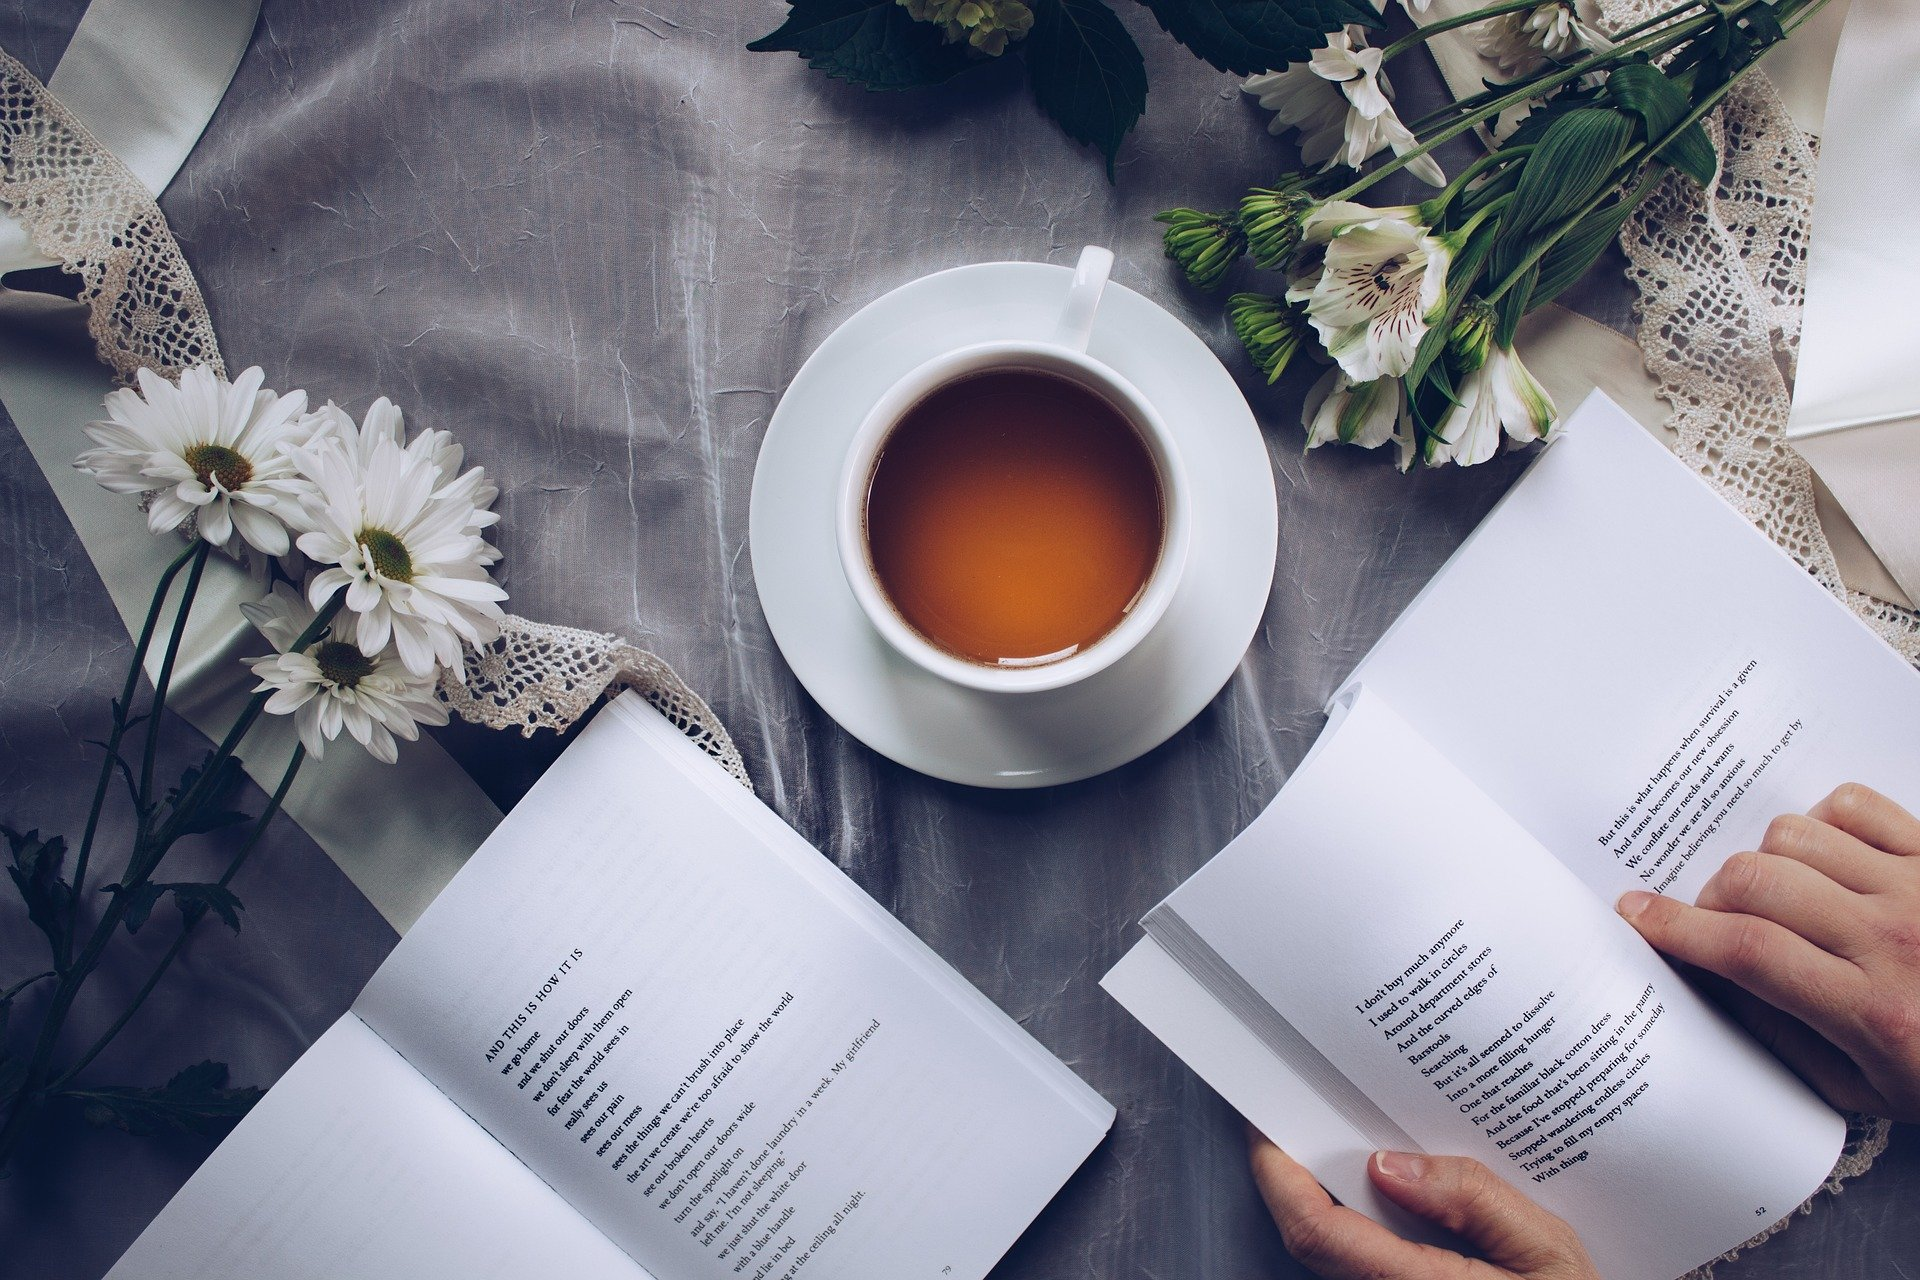 Te, blomster og bøger